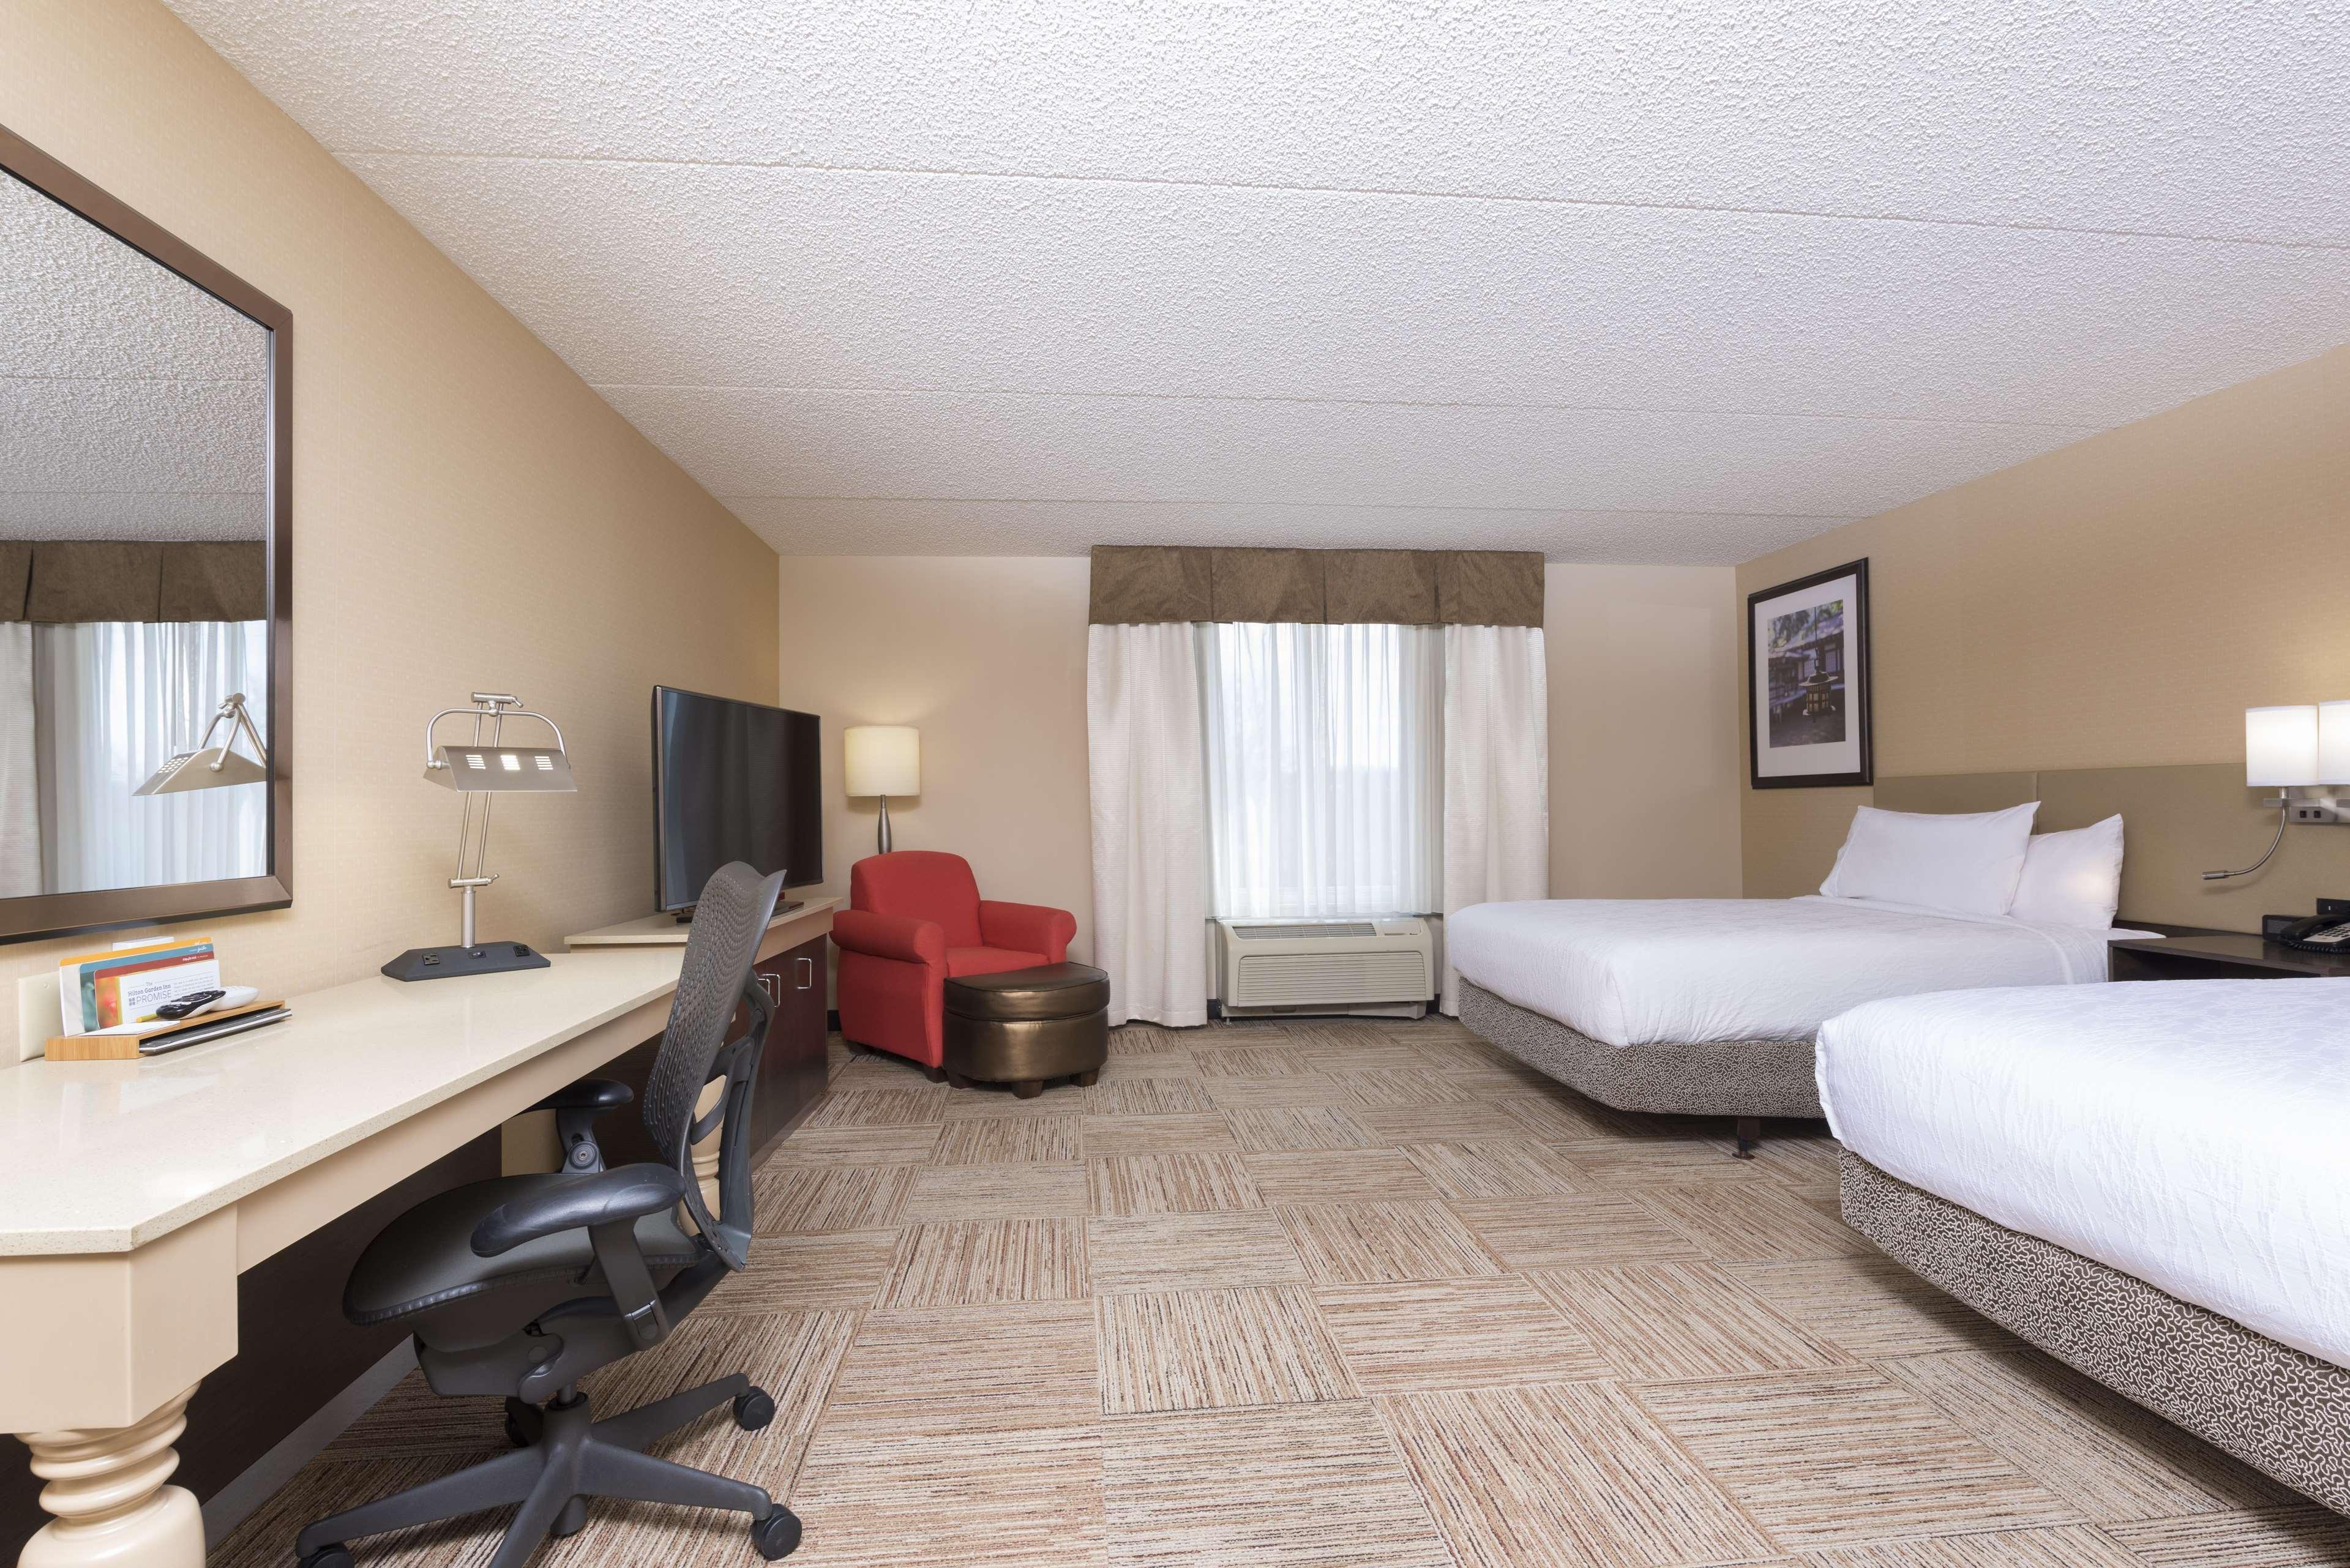 Hilton Garden Inn West Lafayette Wabash Landing image 28